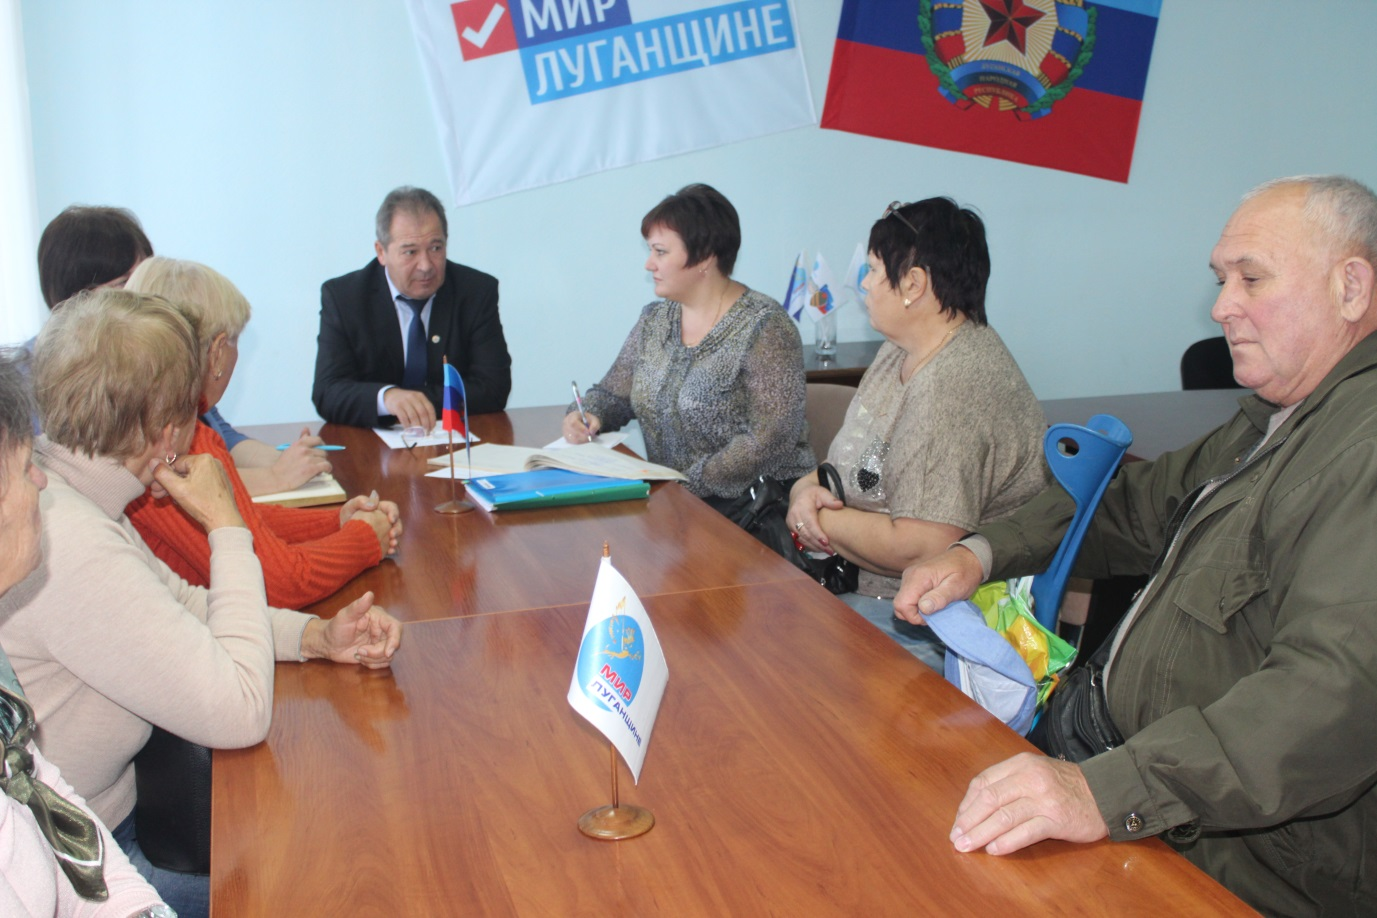 Александр Дейнека провел прием граждан в Славяносербске 1